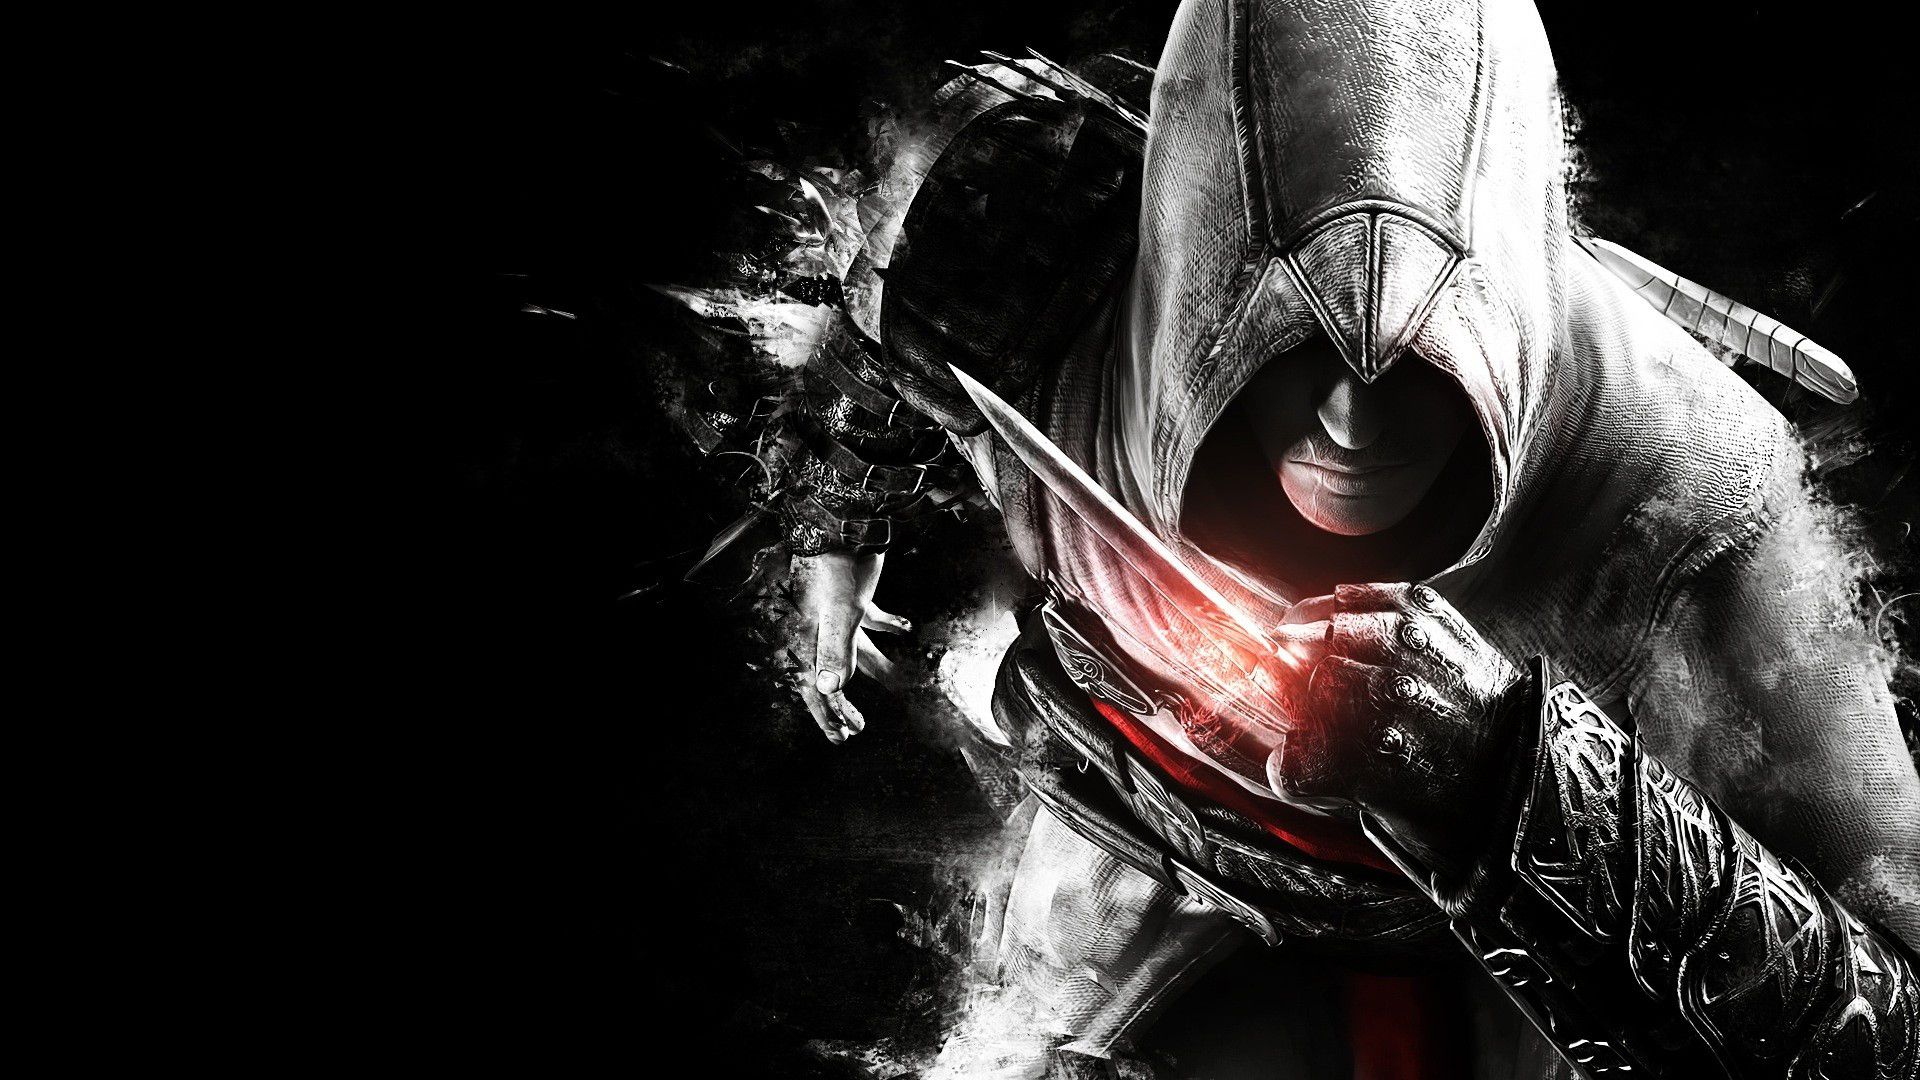 Cool assassins creed 4 wallpaper hd httpimashonwcool cool assassins creed 4 wallpaper hd httpimashonw voltagebd Choice Image